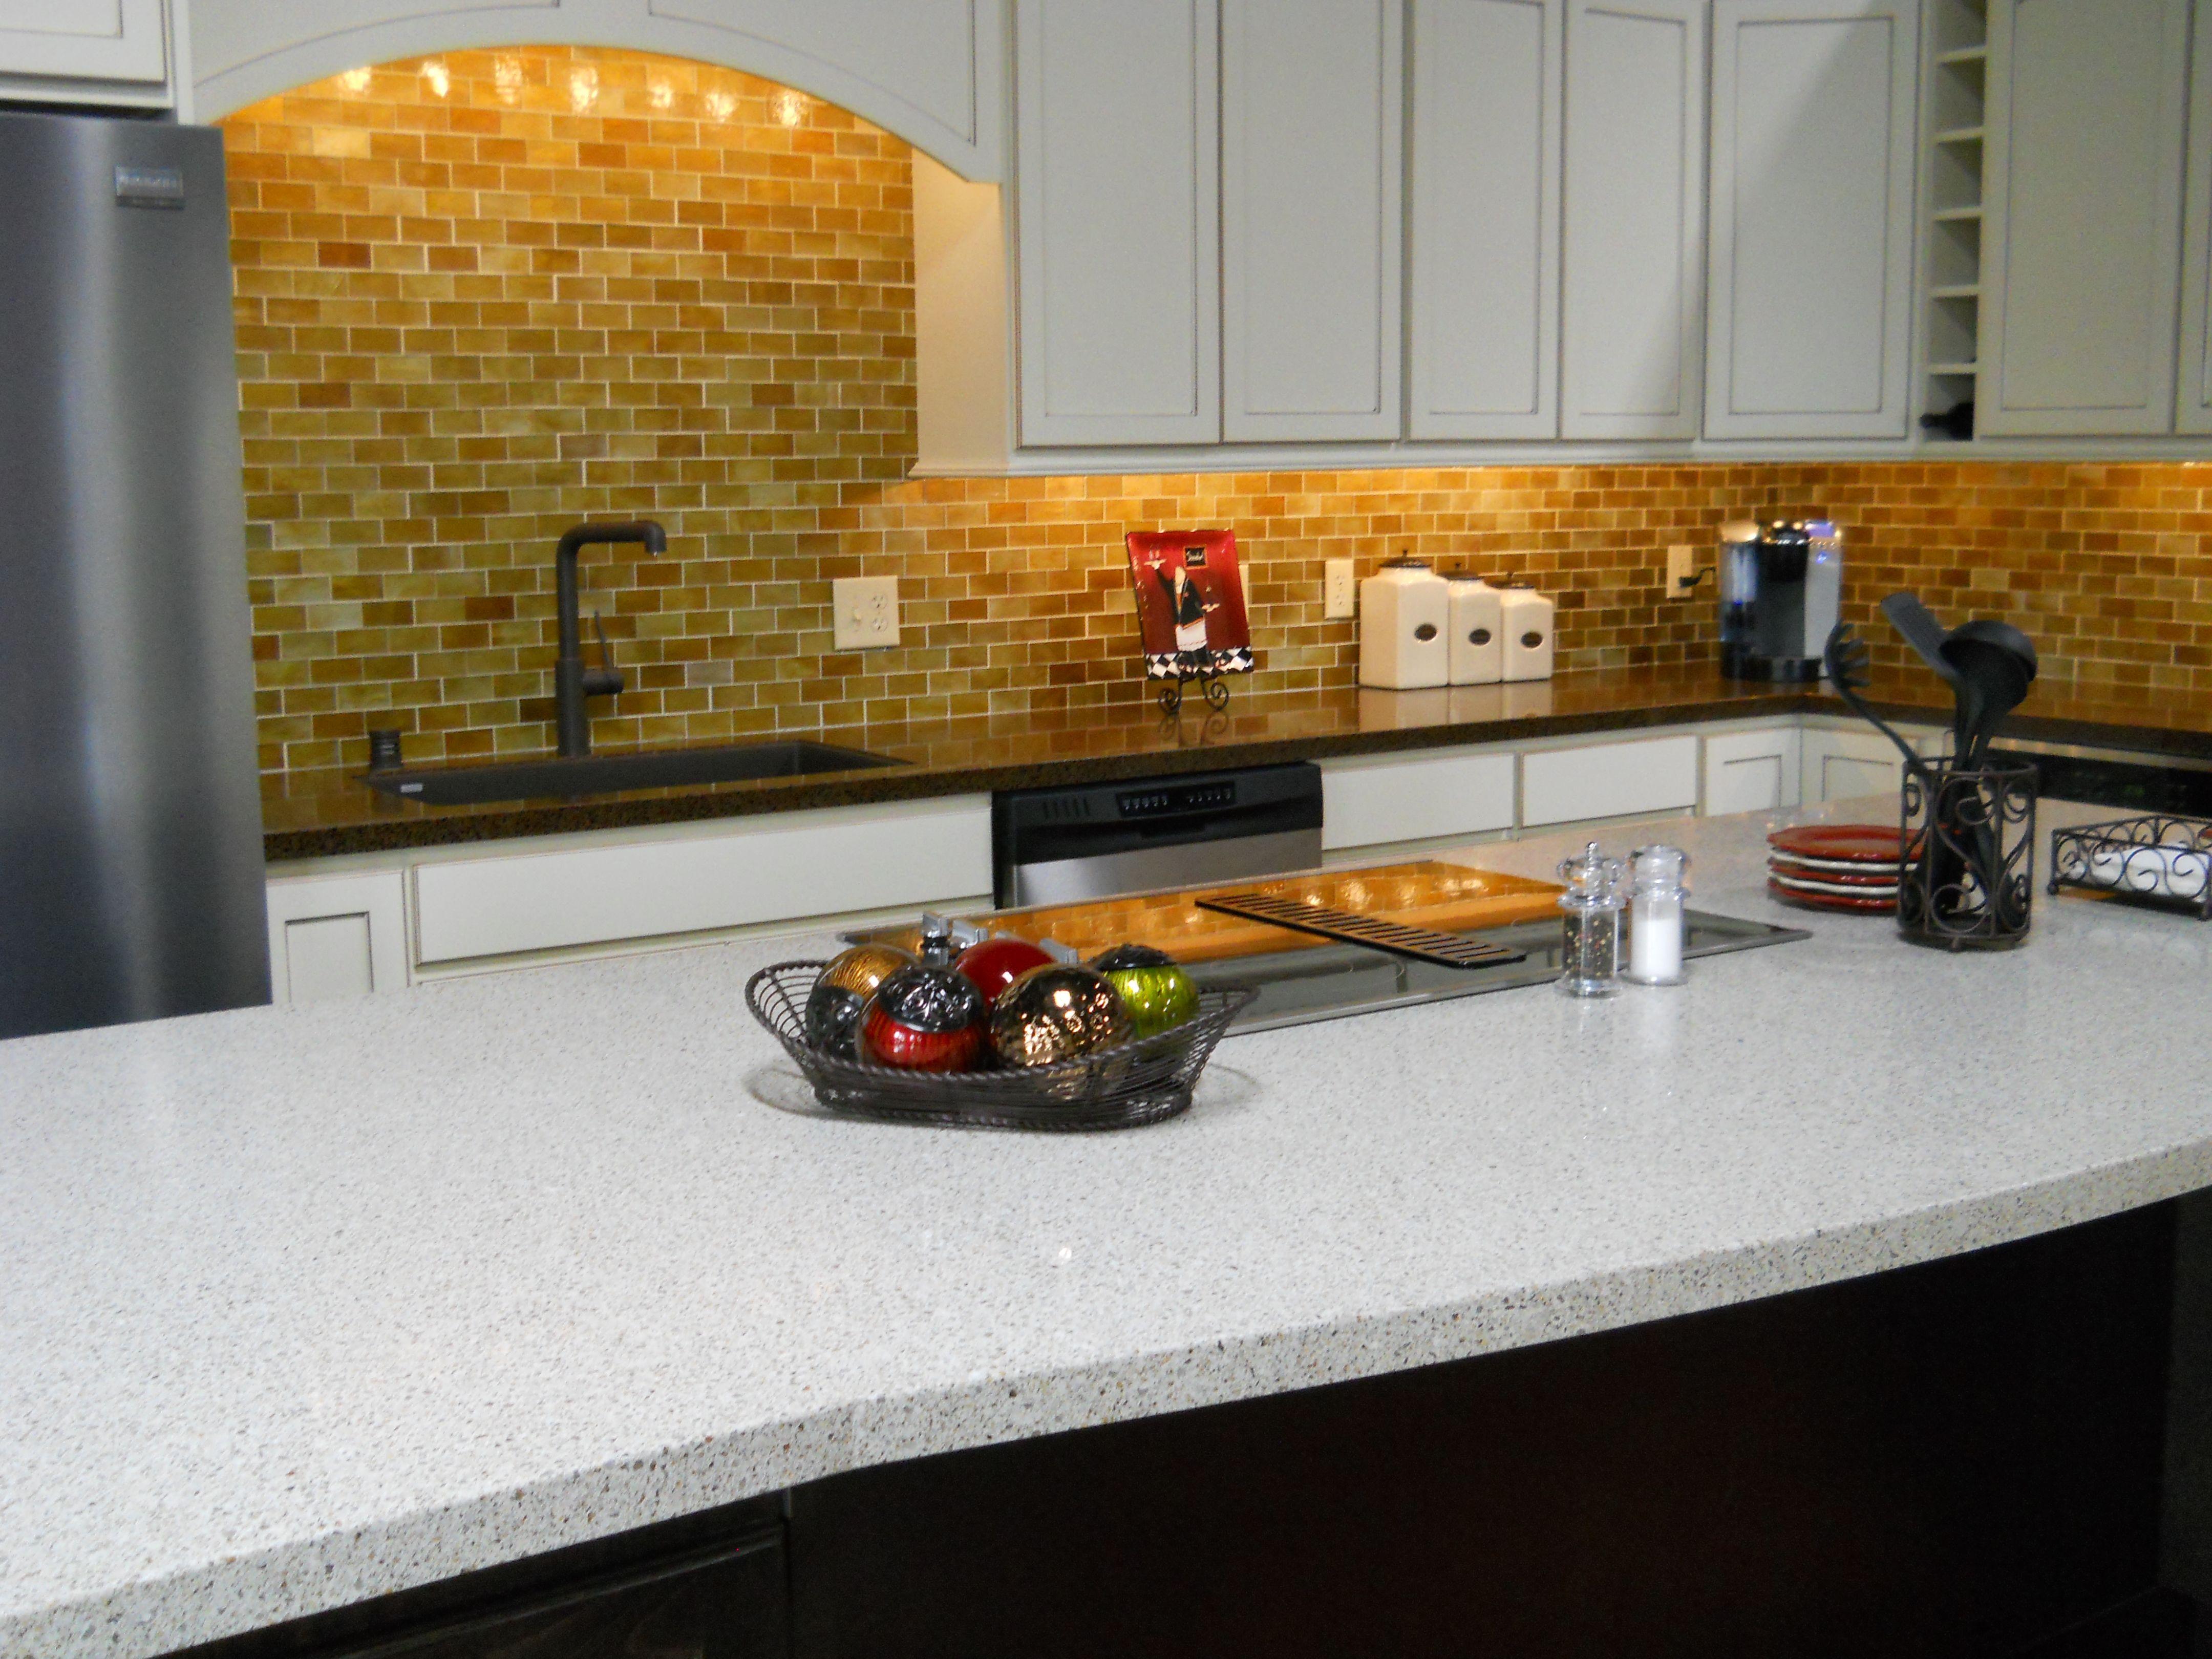 Kitchen Counters Tile Back Splash Kitchen Remodel Kitchen Kitchen Counter Tile